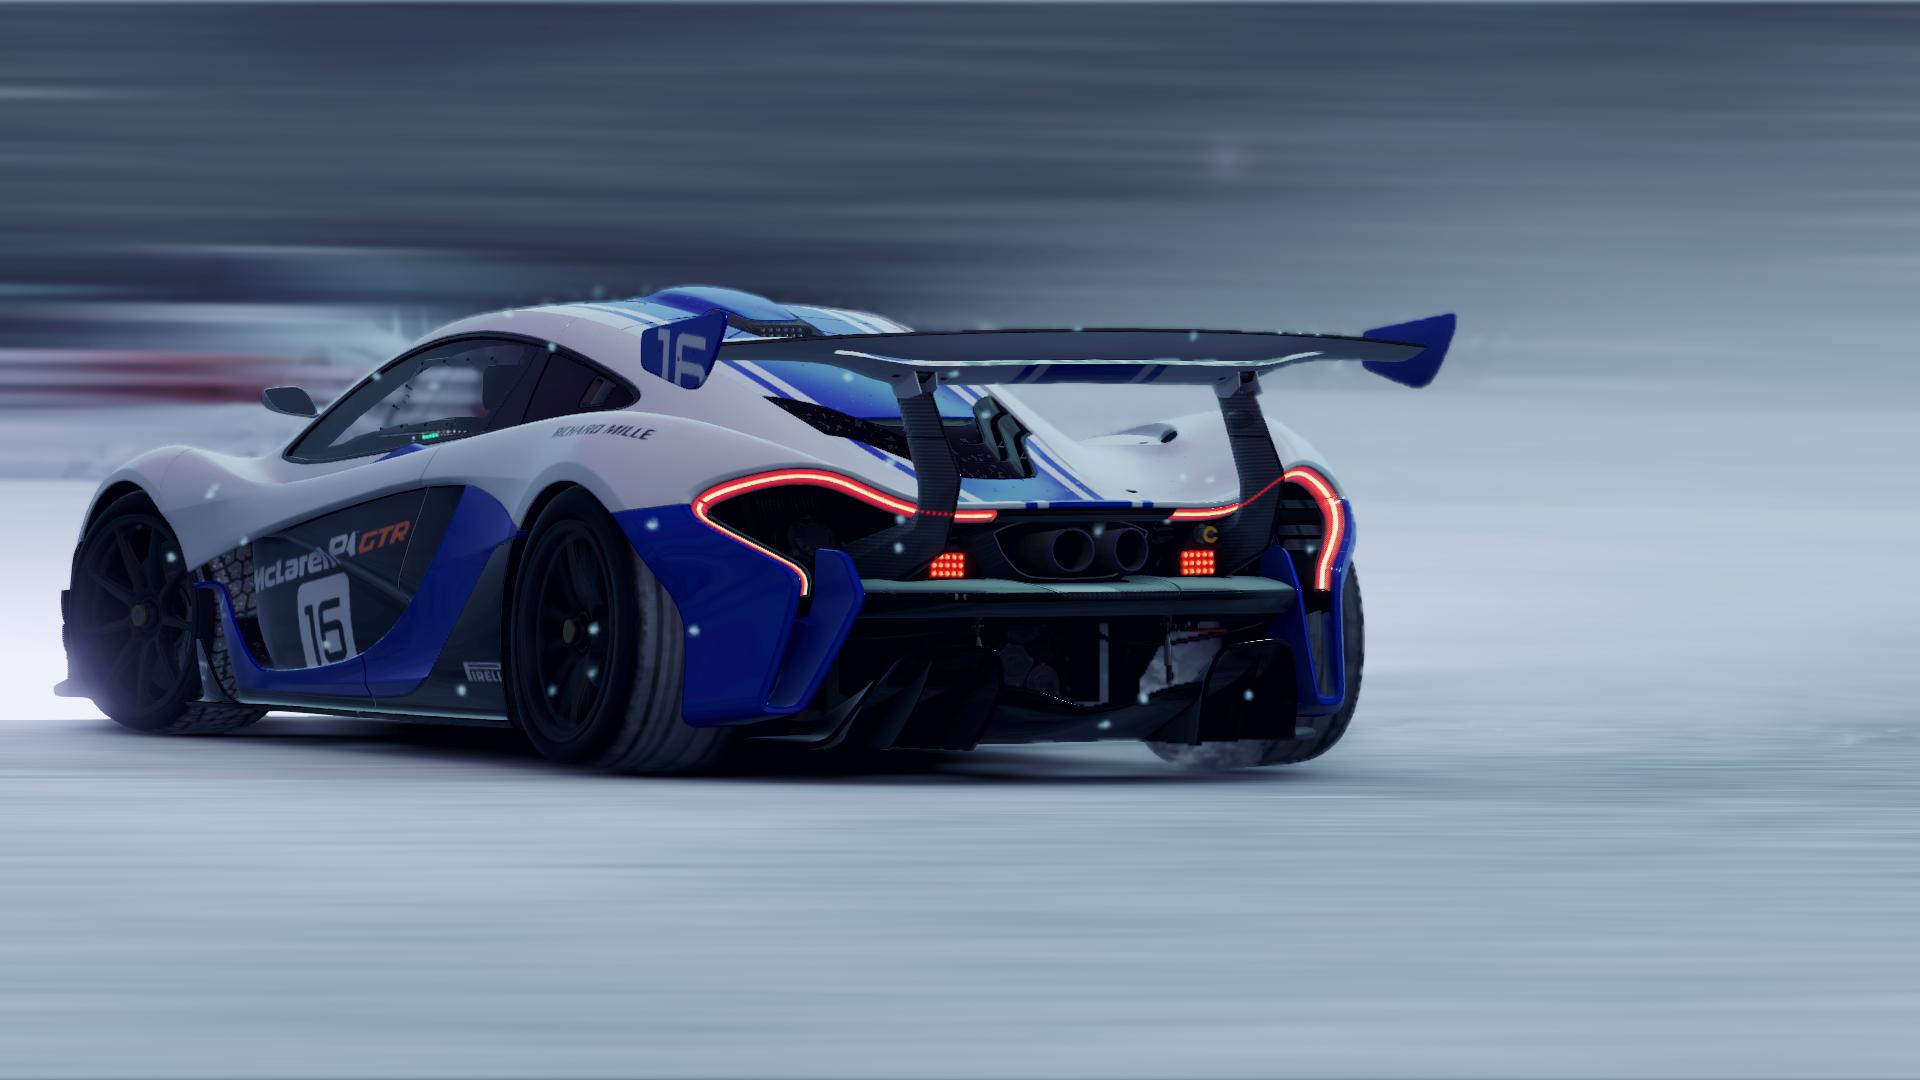 Project-CARS-2-McLaren-P1-GTR-Chikane.png